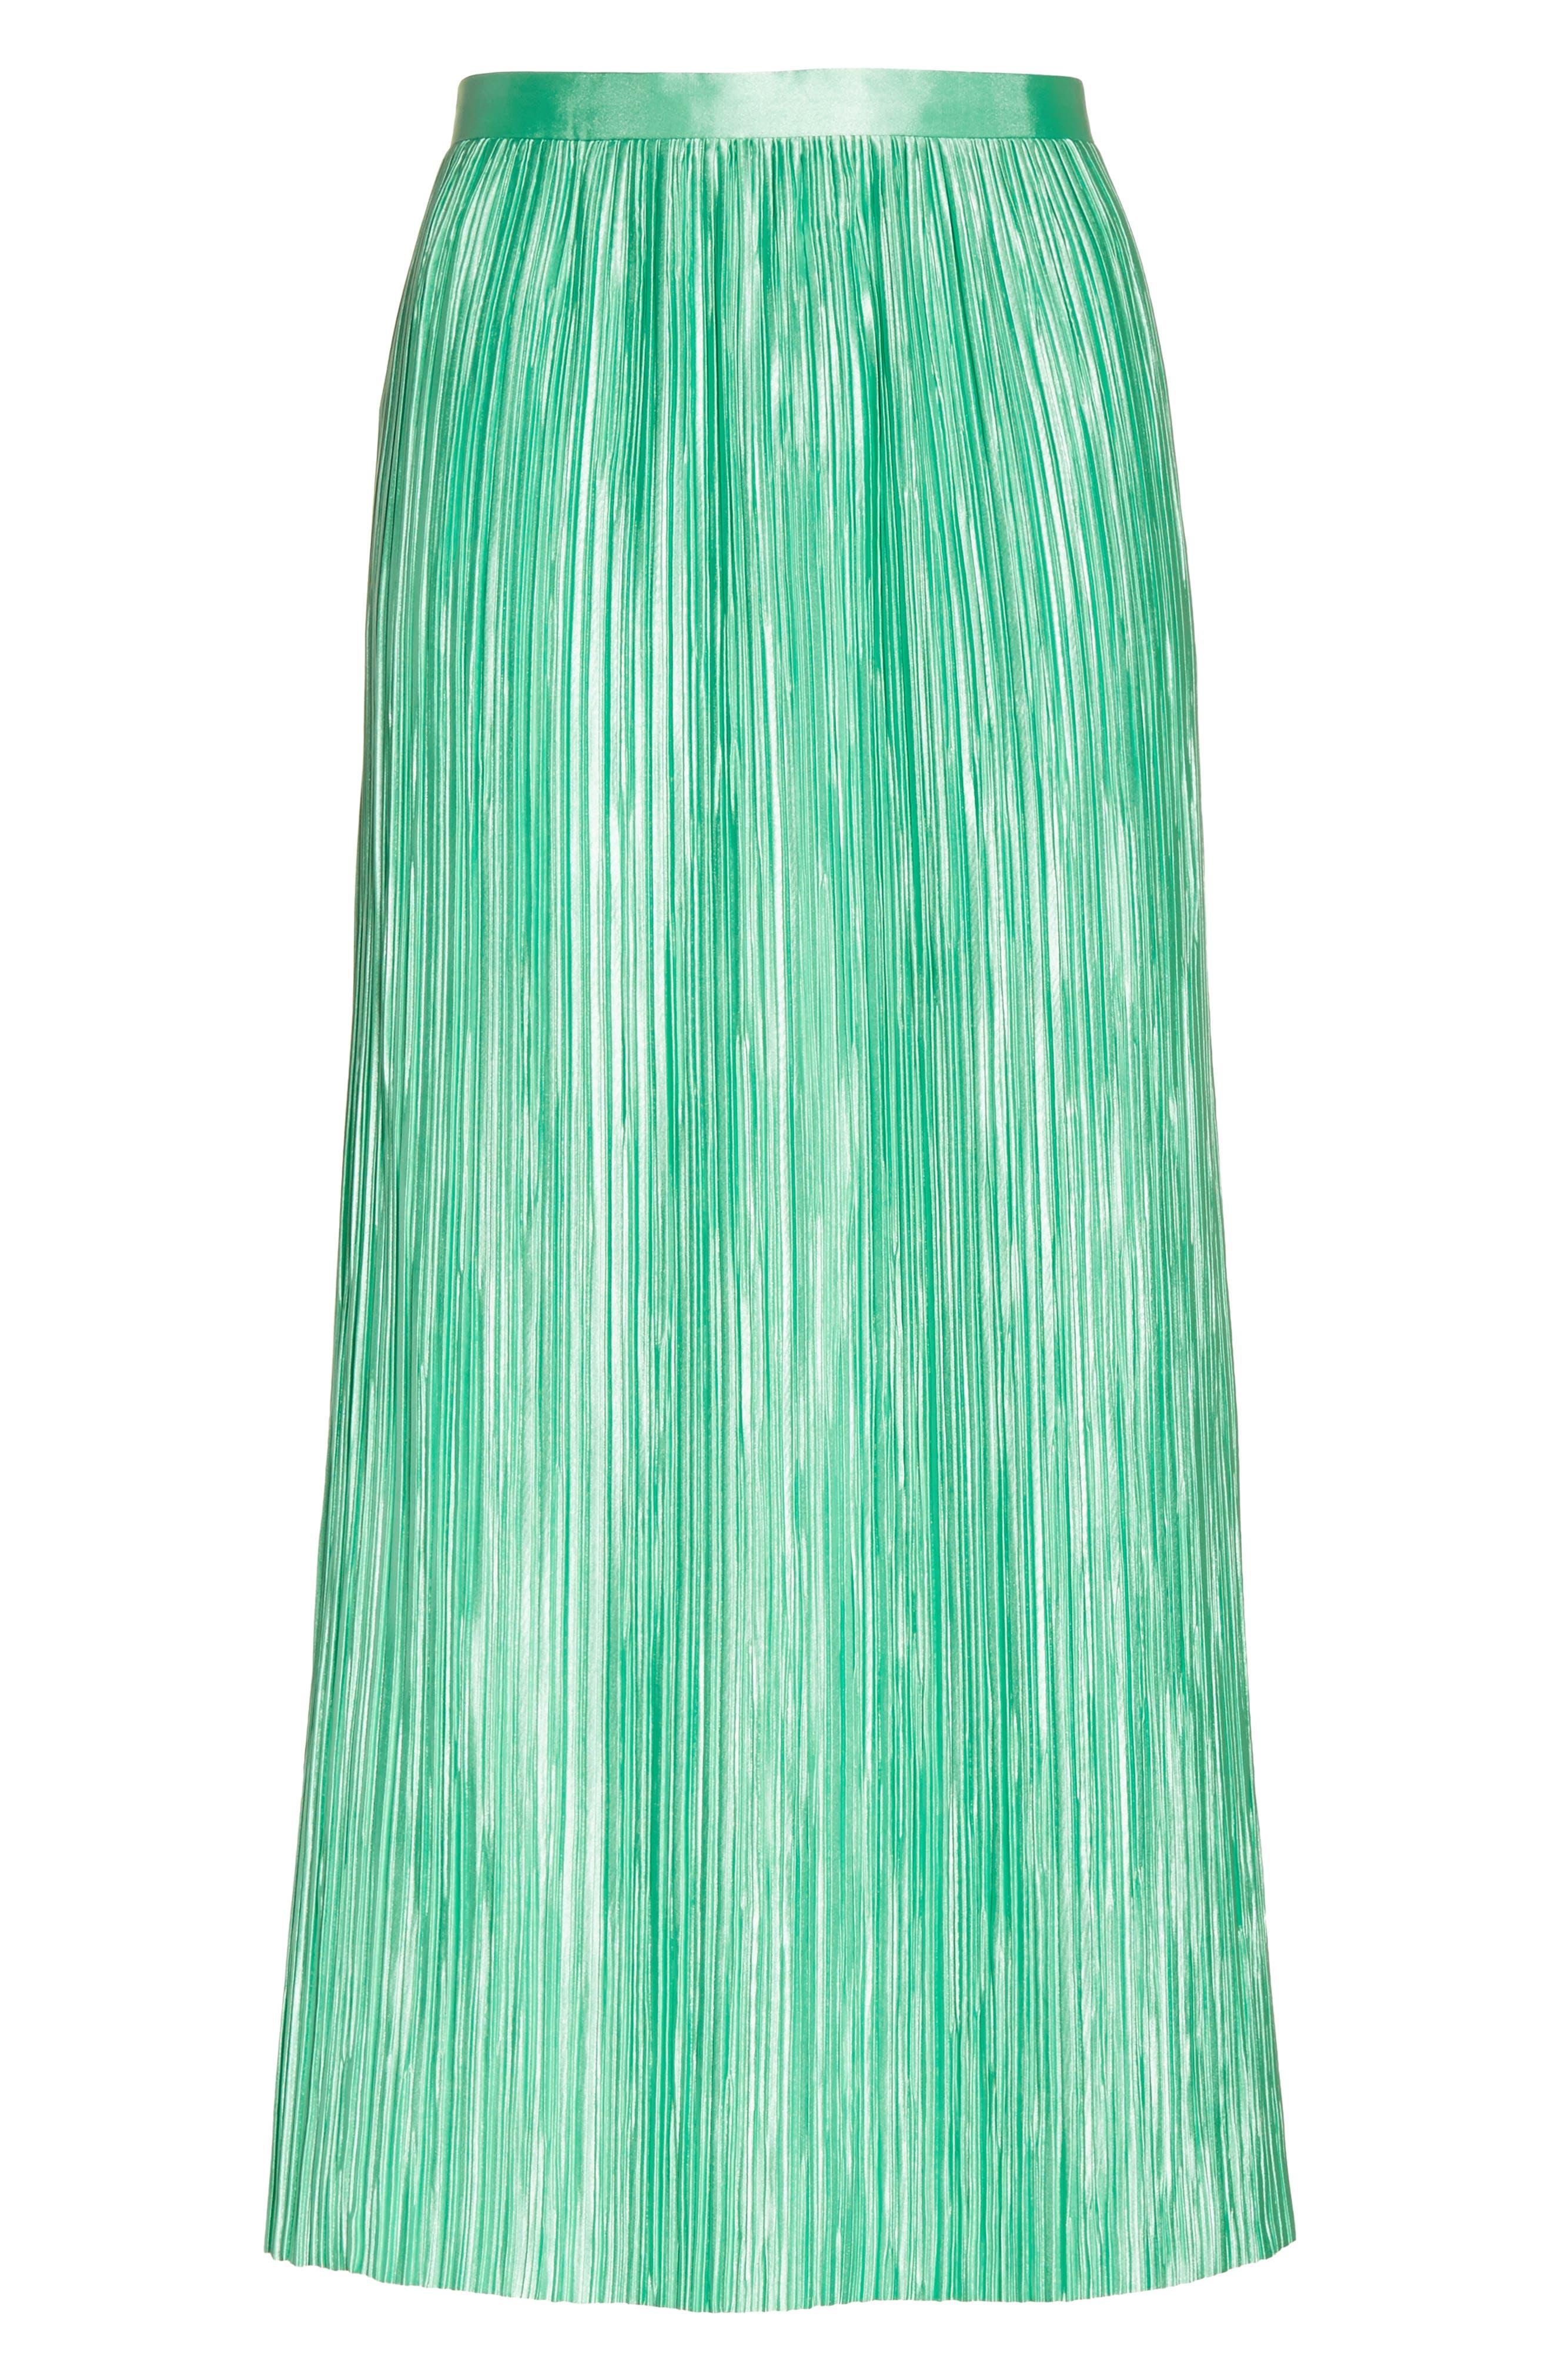 Plissé Pleated Midi Skirt,                             Alternate thumbnail 6, color,                             307